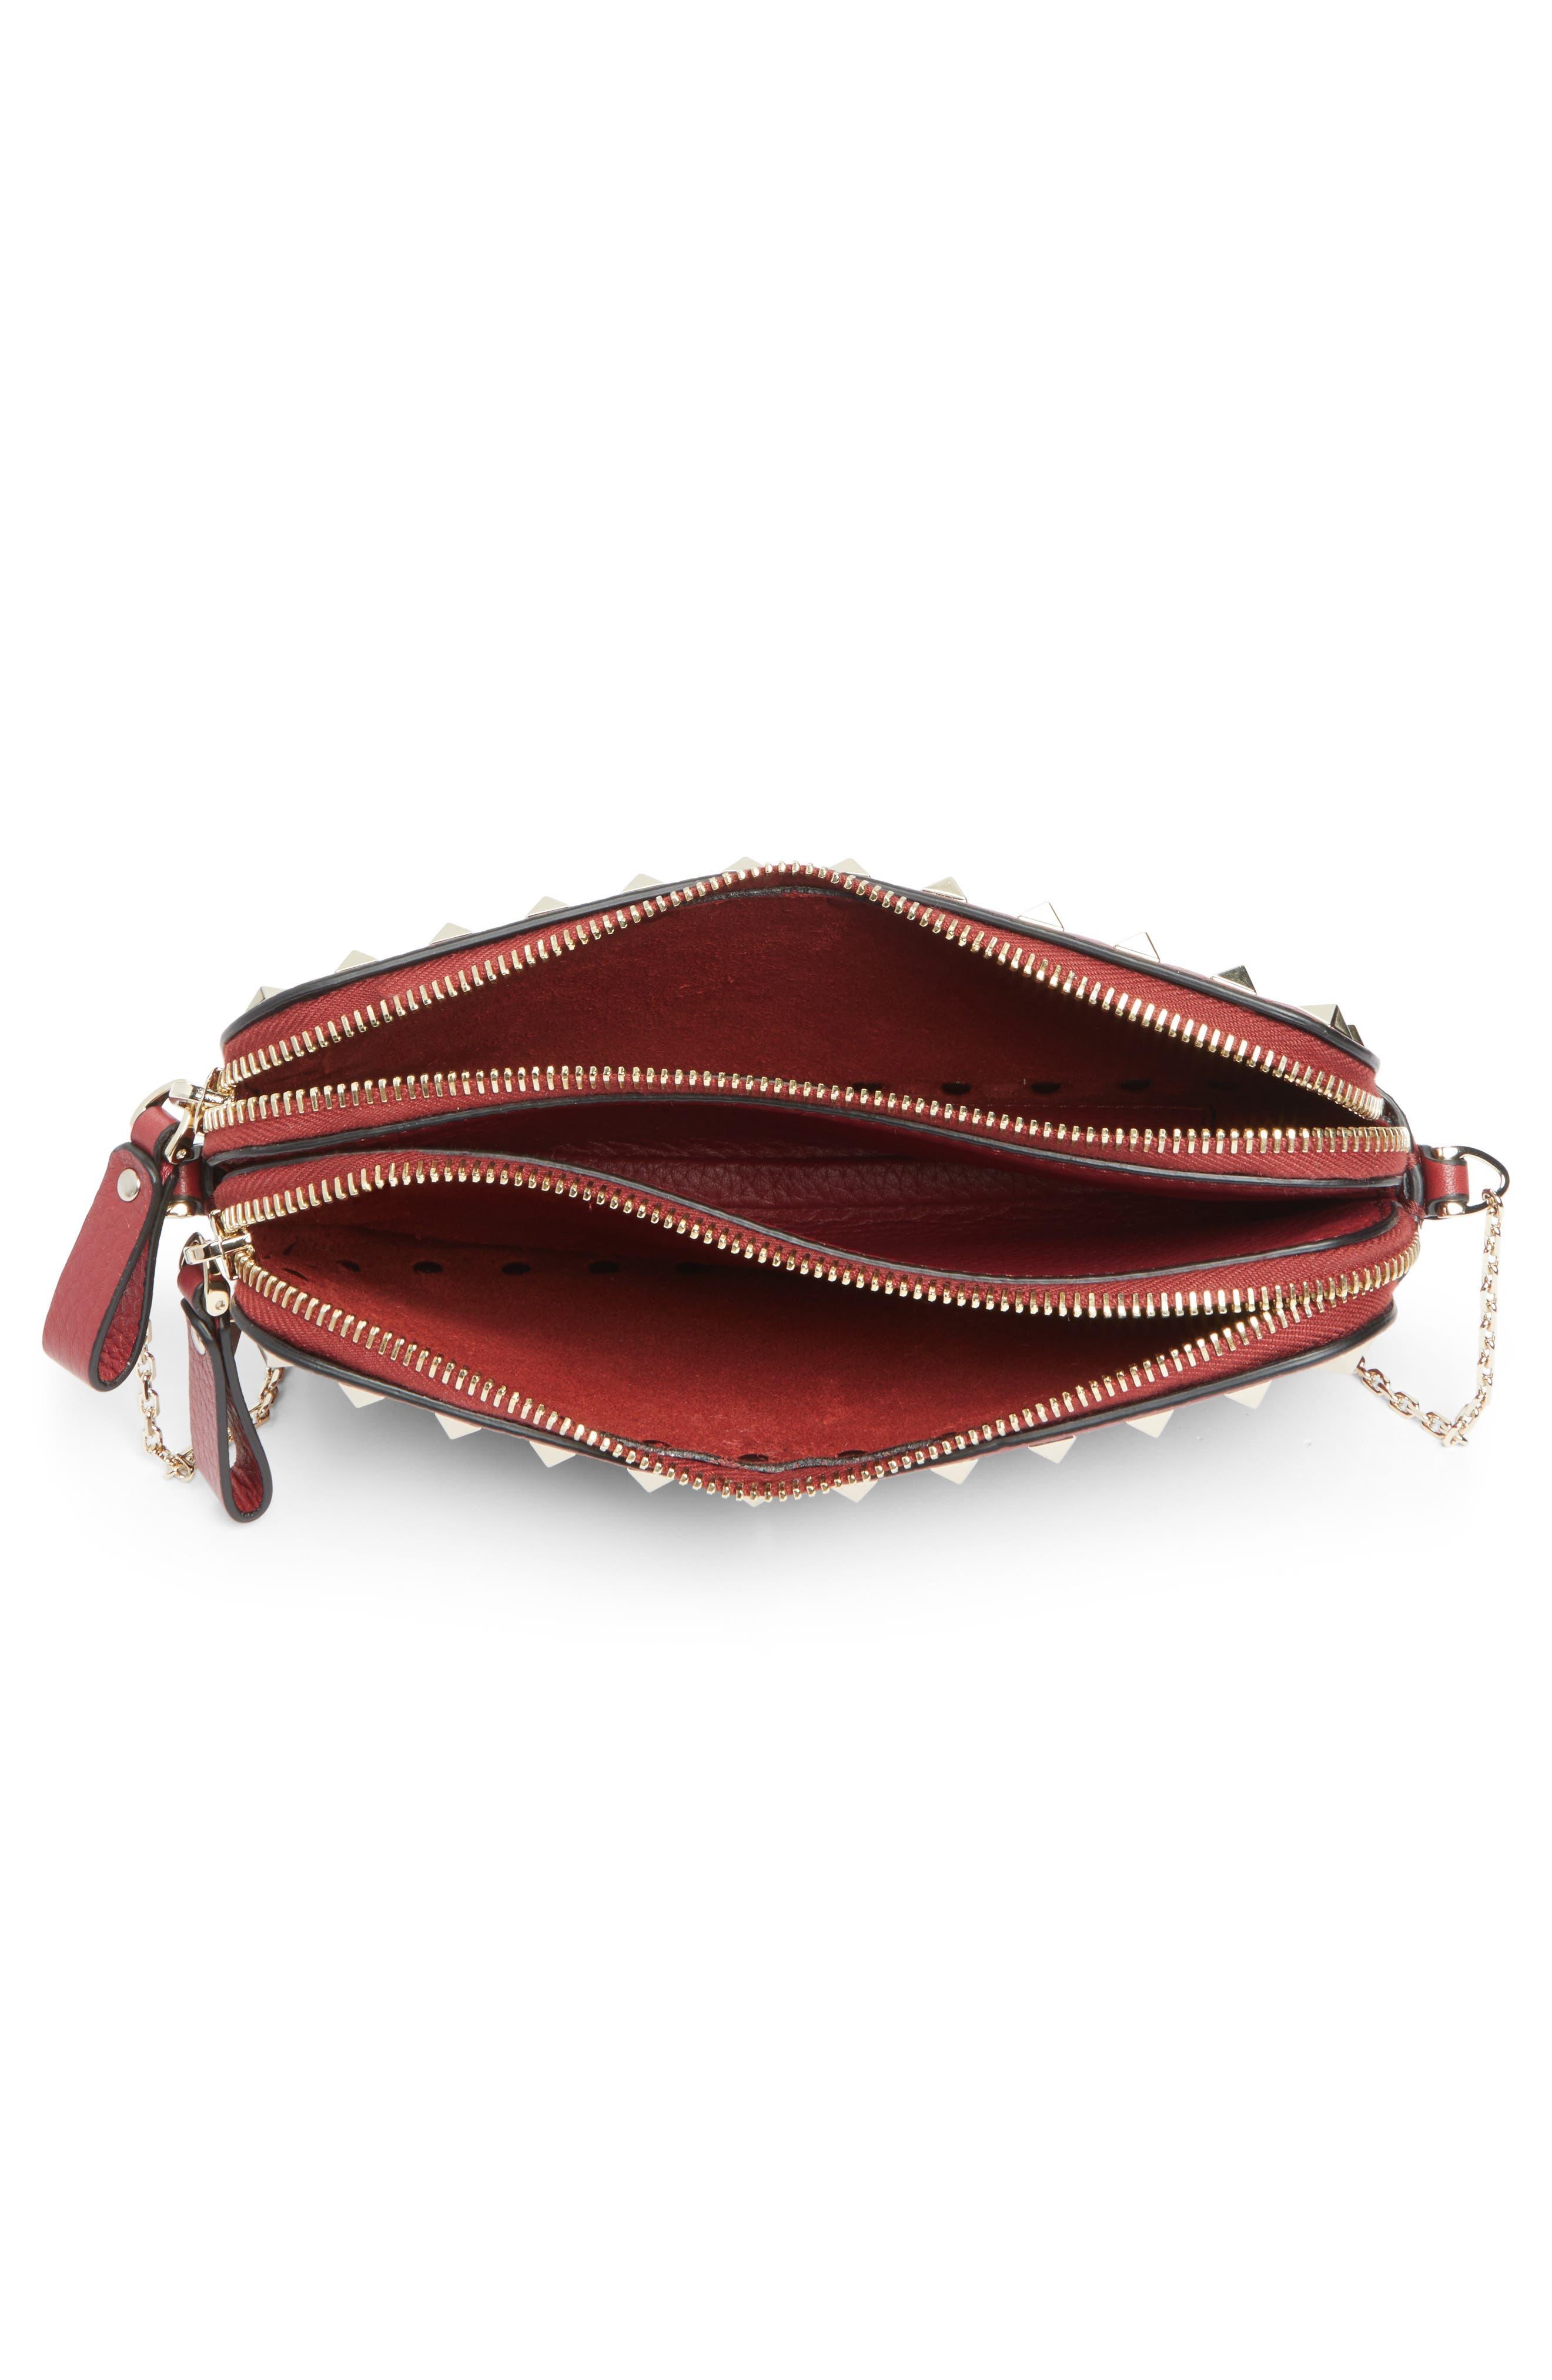 Rockstud Leather Crossbody Bag,                             Alternate thumbnail 8, color,